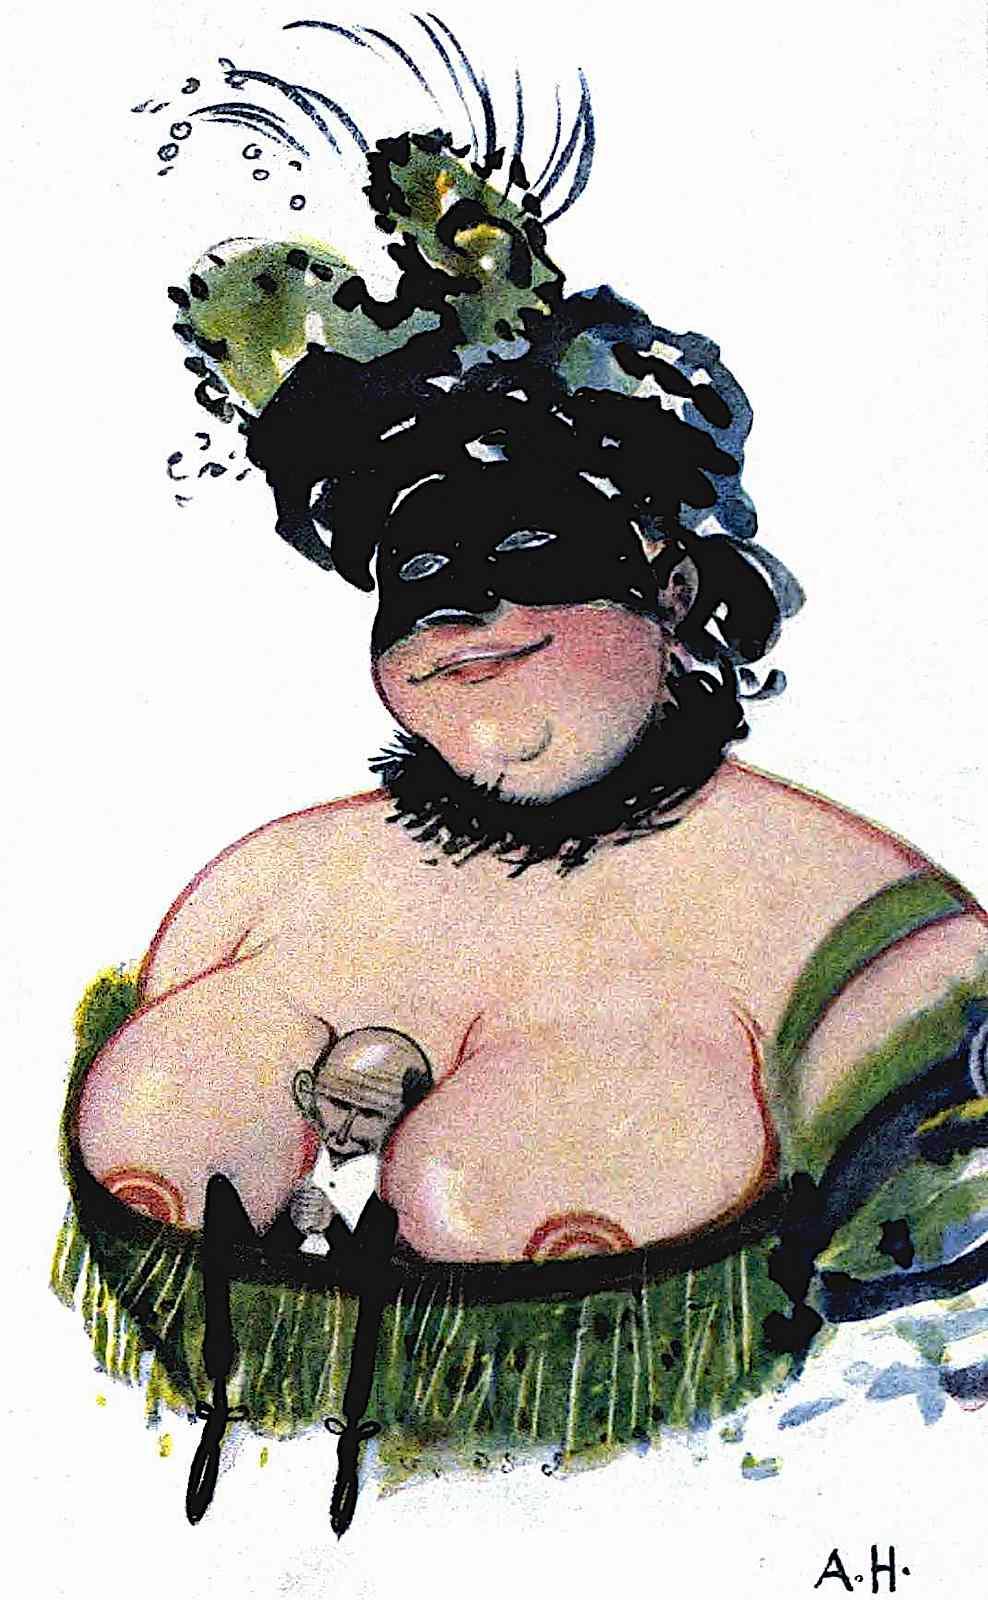 1917 German dominatrix illustration from a German humour publication